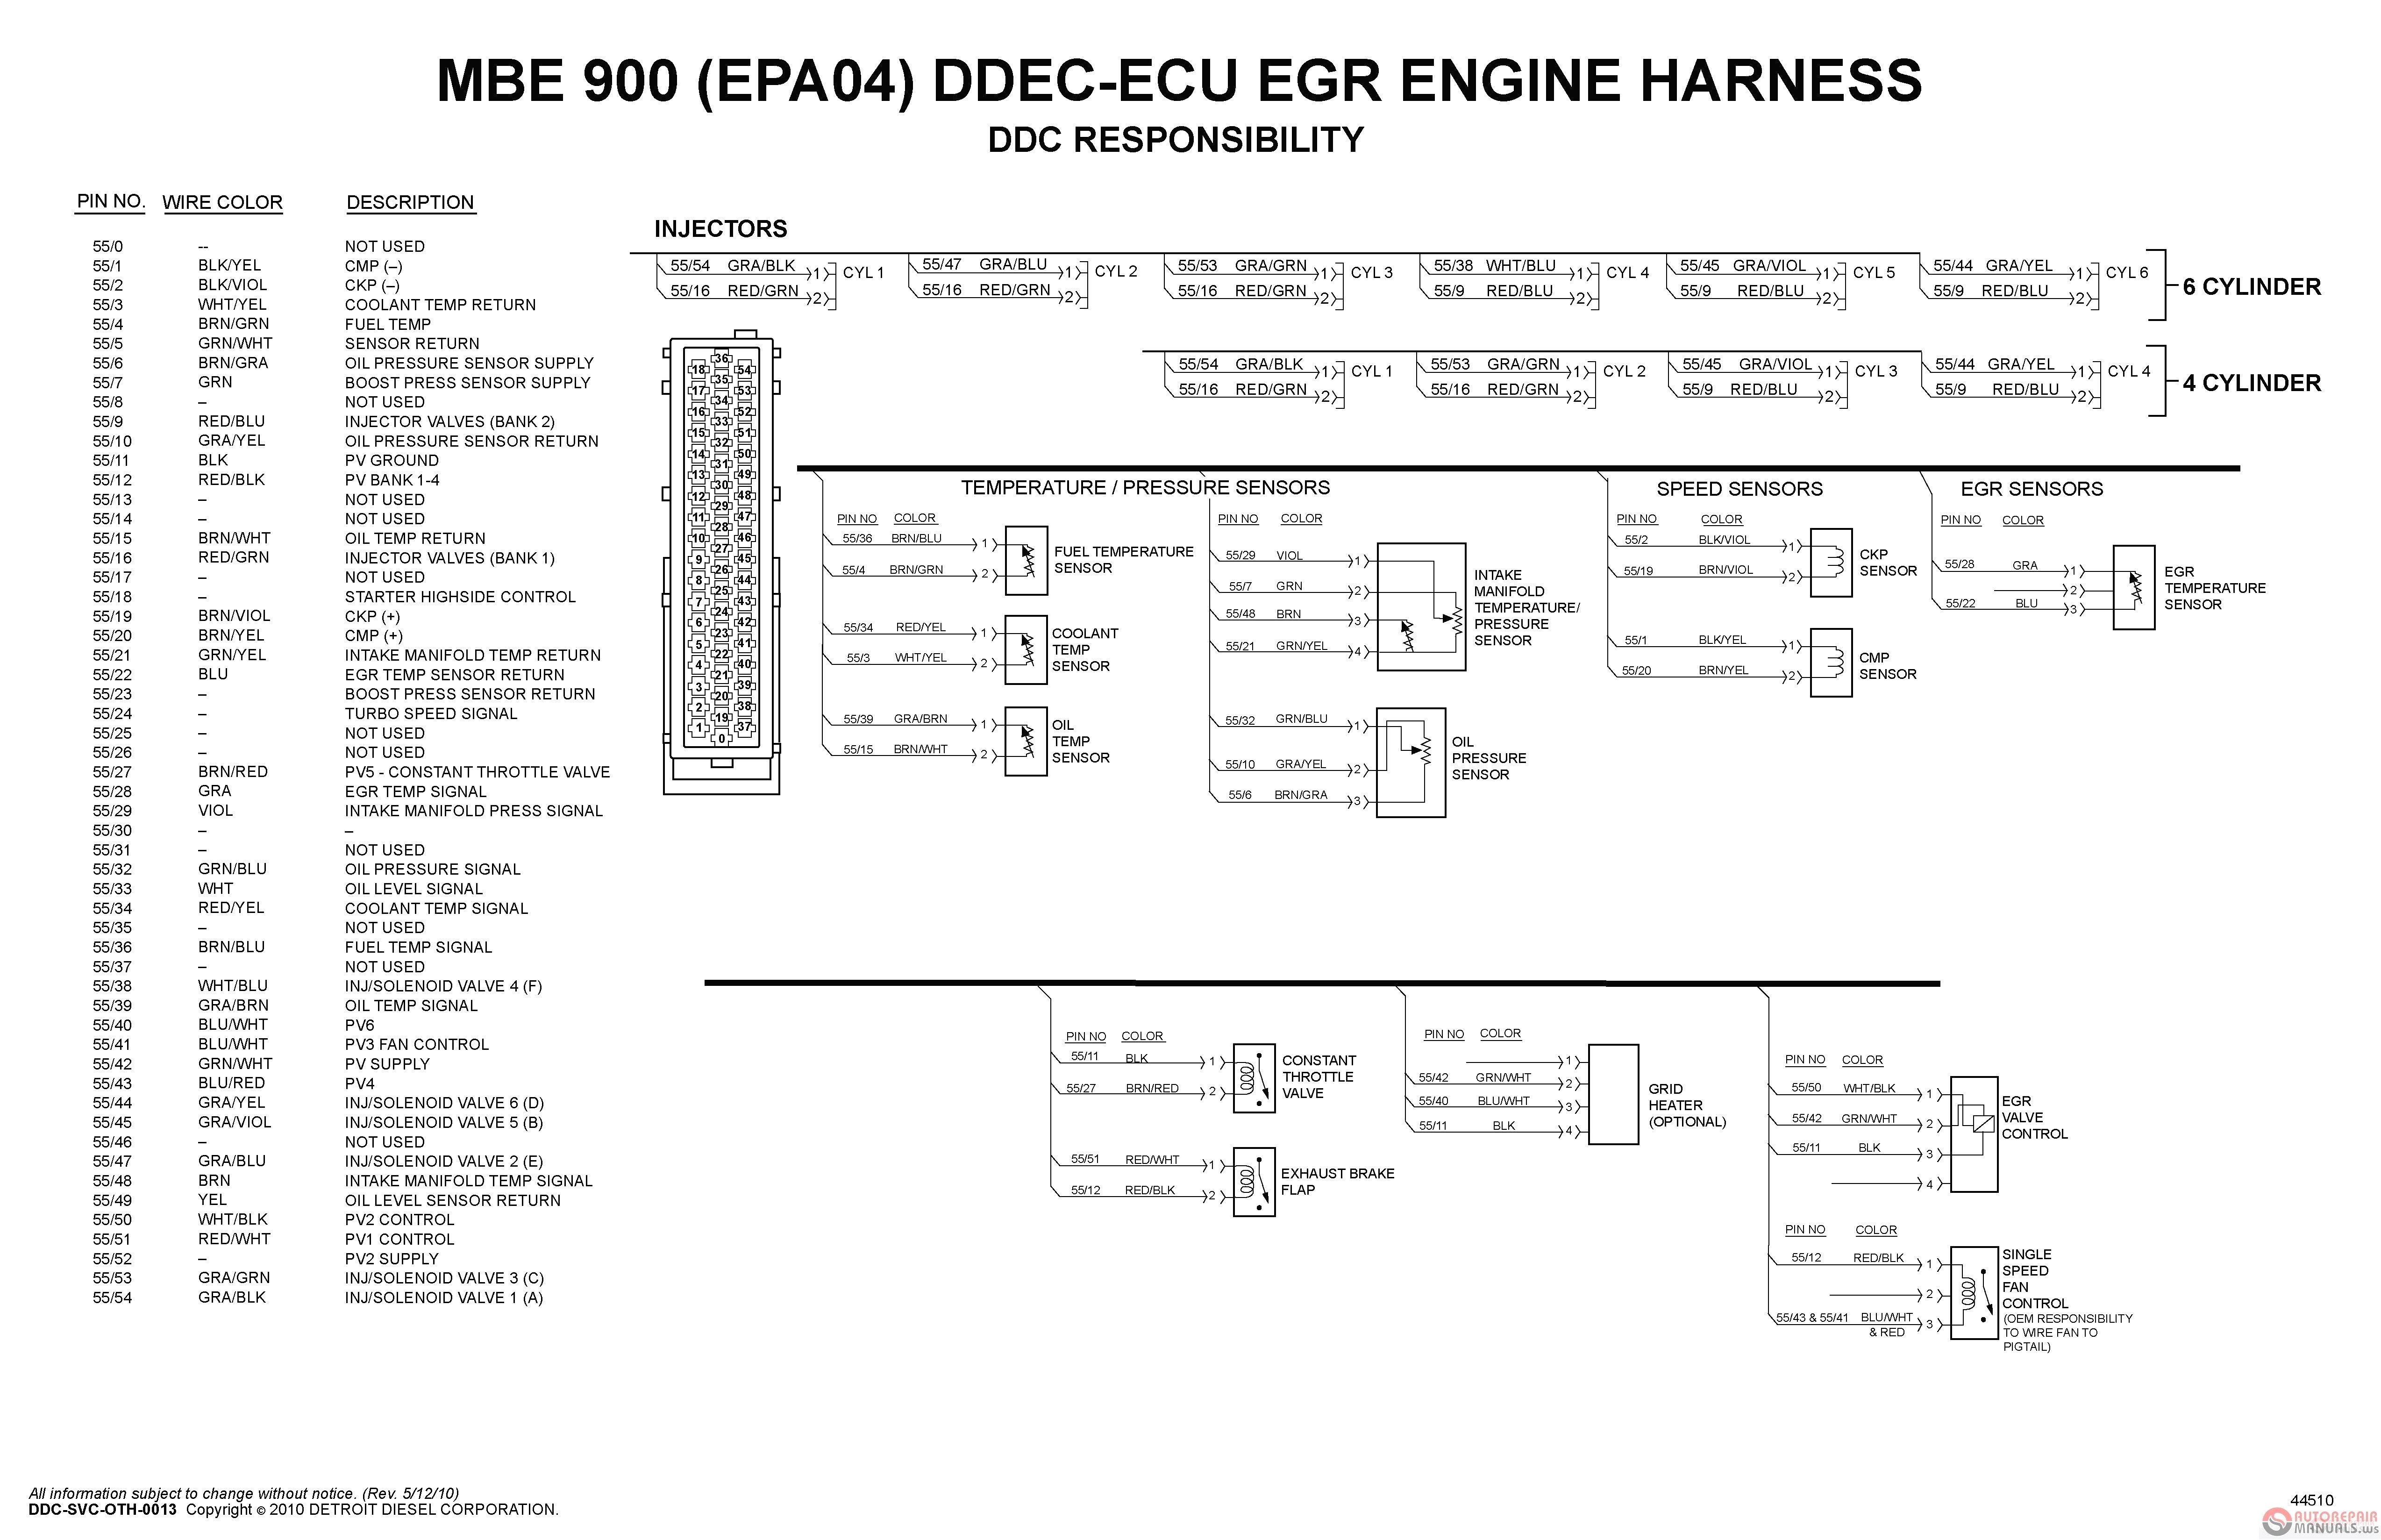 small resolution of detroit diesel series 60 ecm wiring diagram on 1499277944 and at fordetroit diesel series 60 ecm